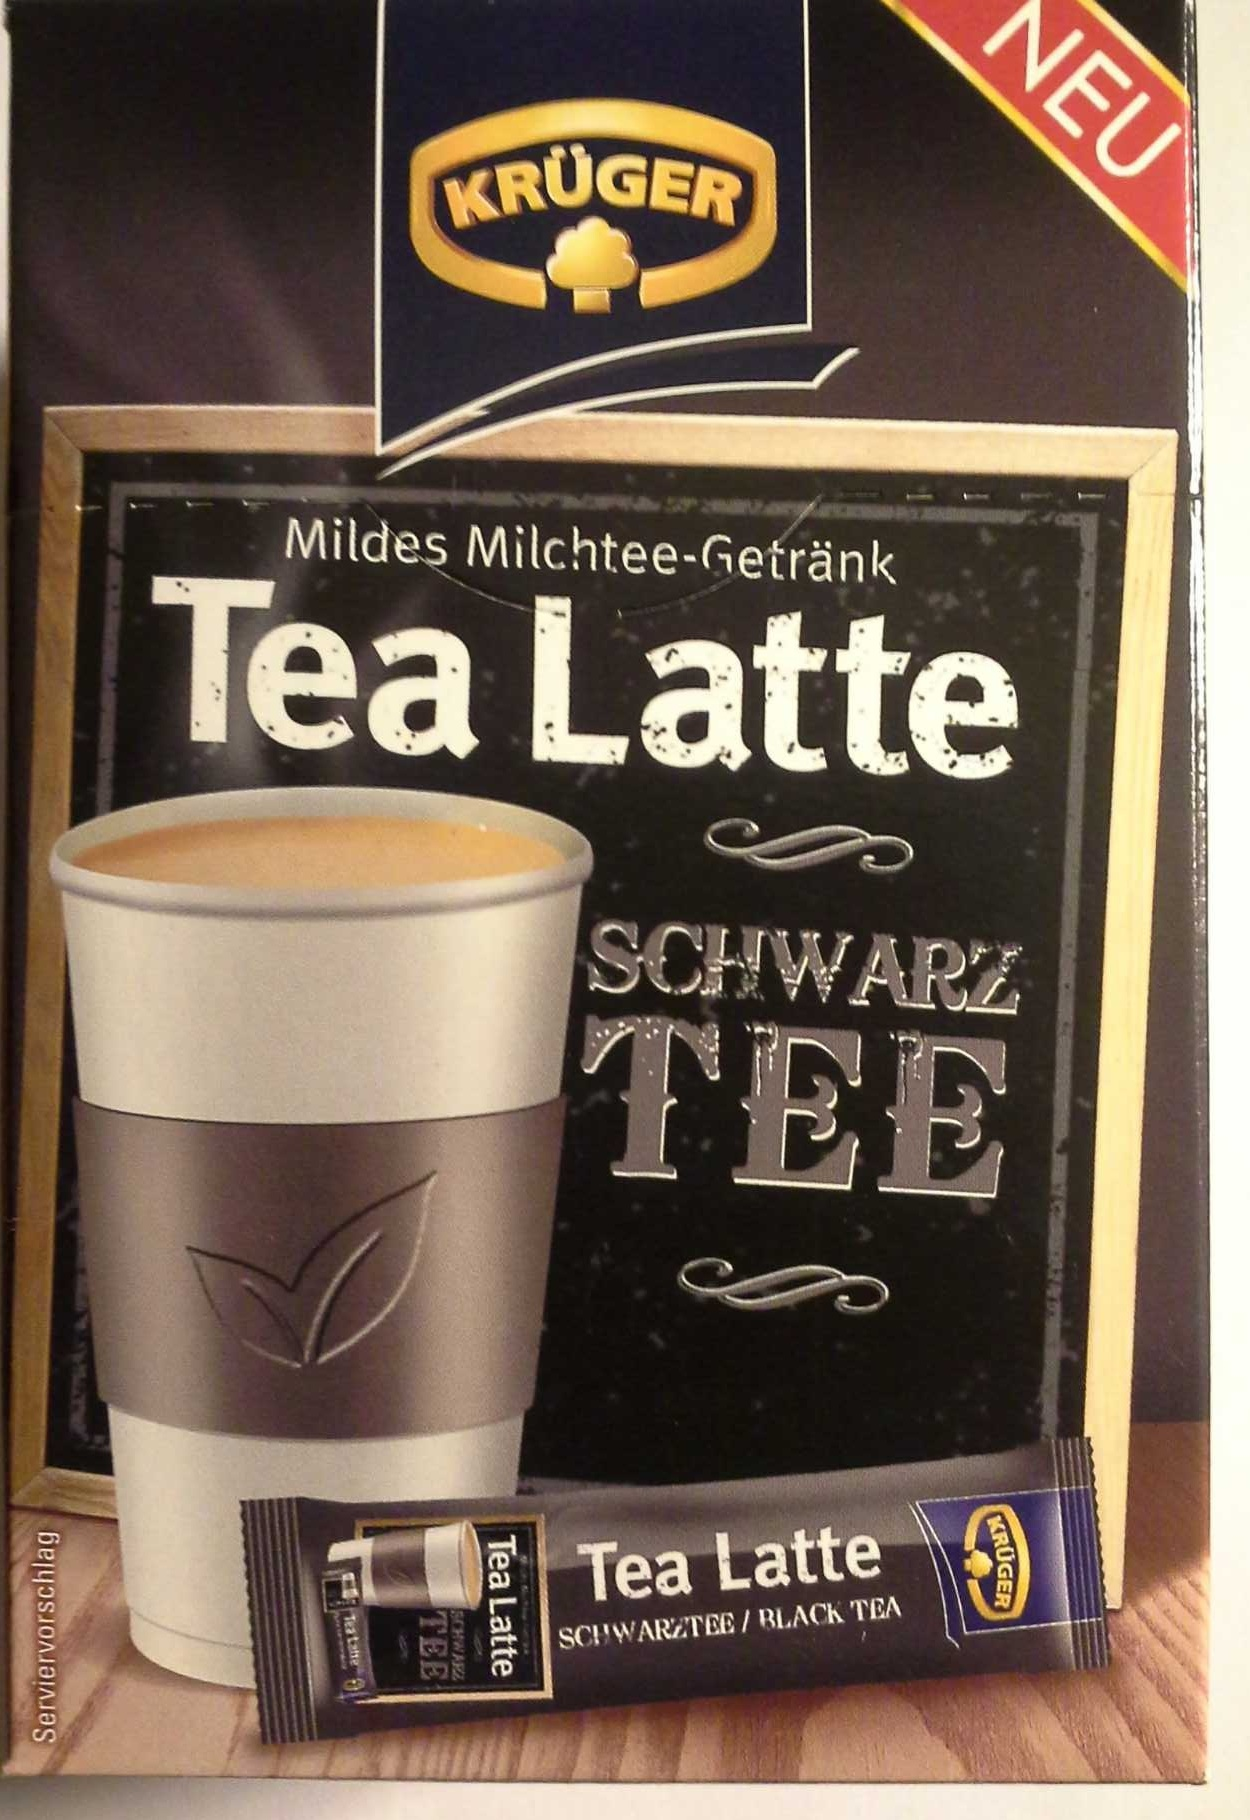 Tea Latte - Product - en